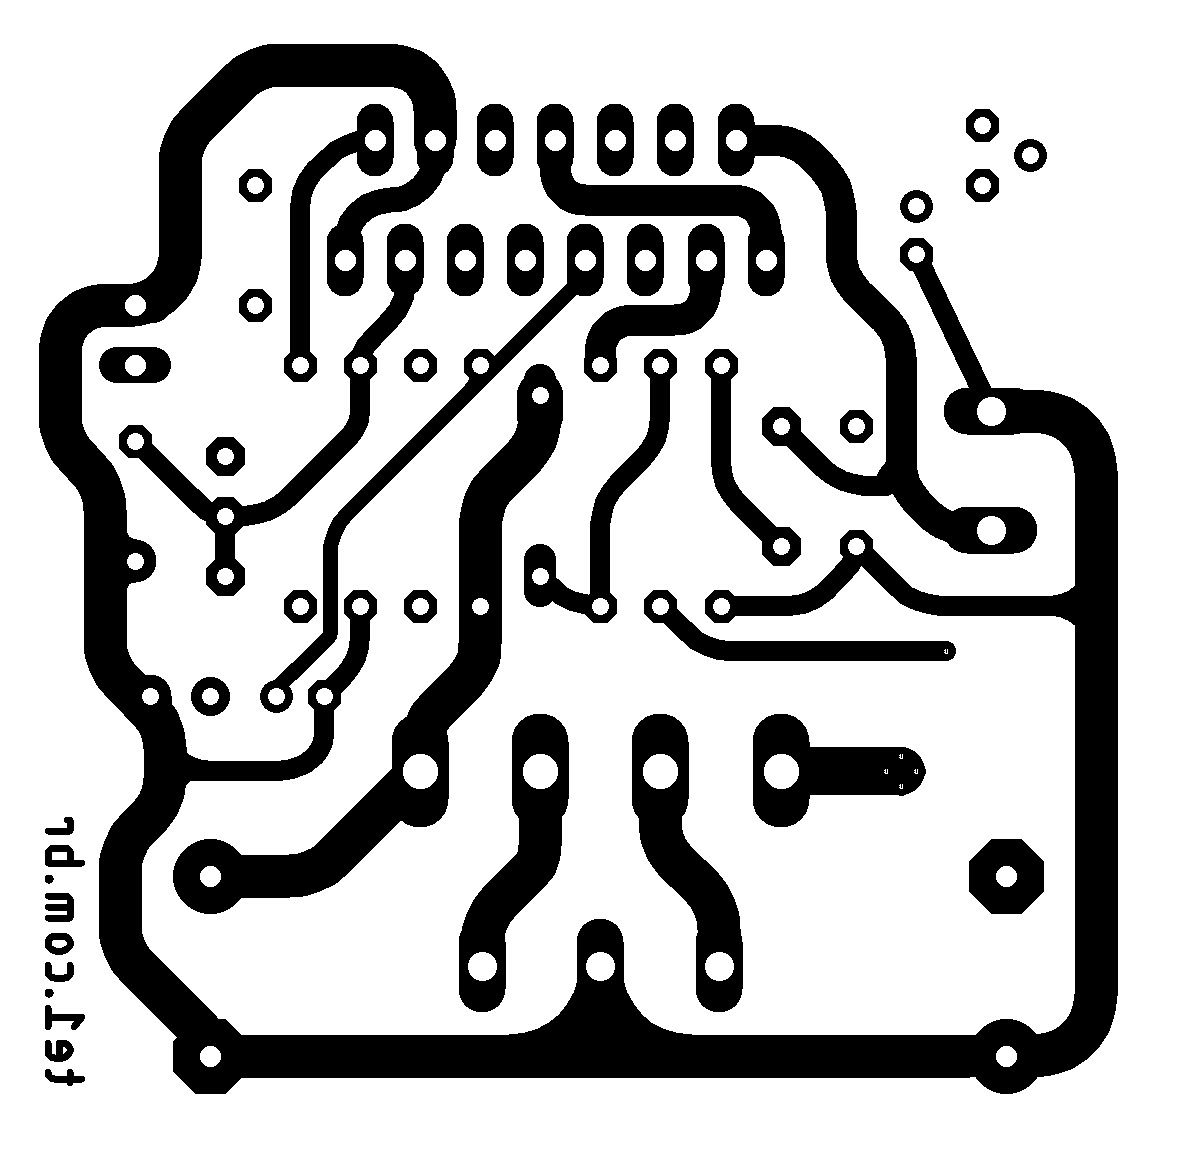 Pcb Layout Tone Control Newgen Ta284 Electronic In 2018 Tda7293 Audio Amplifier Mono With Ic 100 Watts Xtronic Minimus Amplificador Potncia Ci Tda7294 700x677